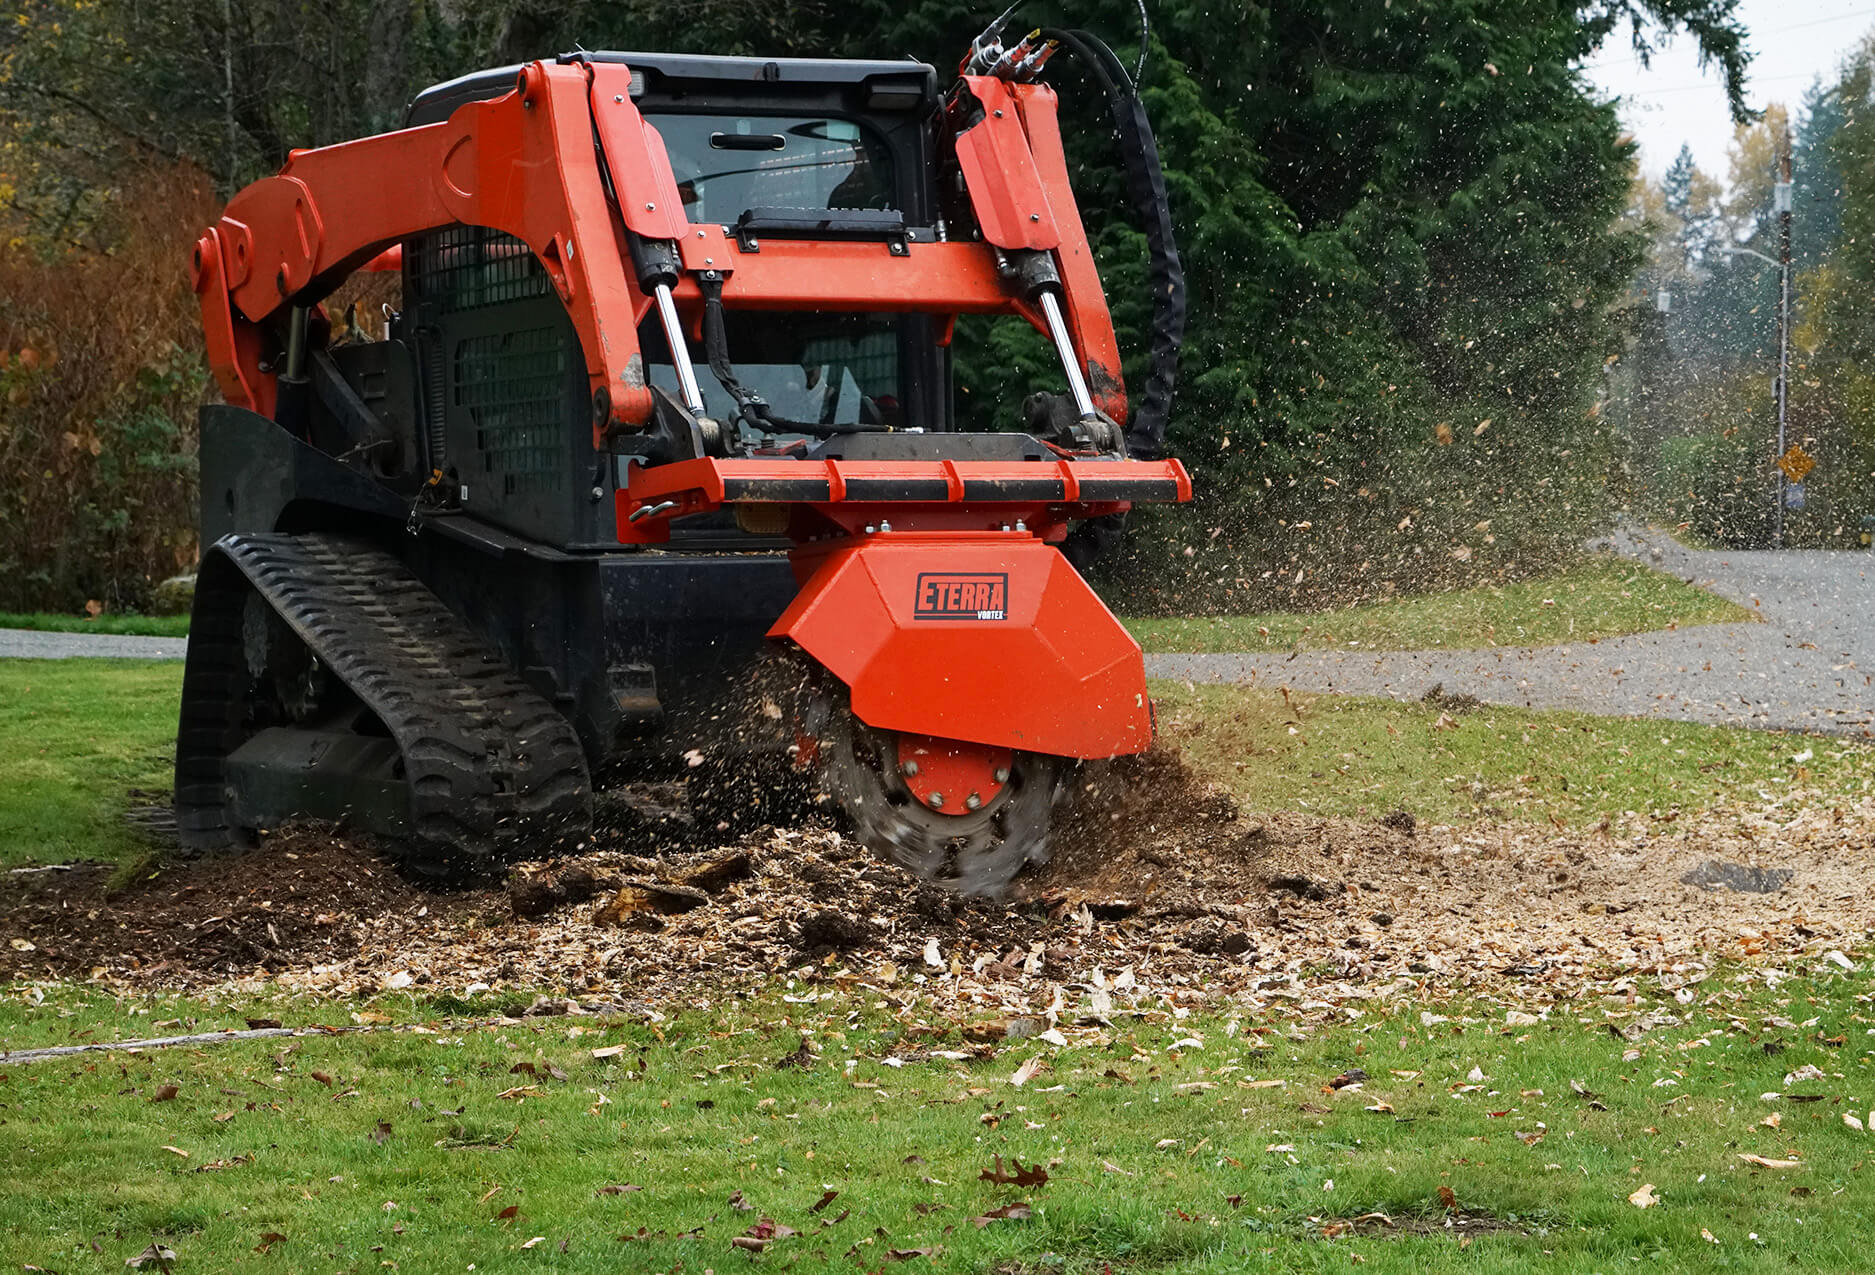 Skid Steer Stump Grinder action grinding stump